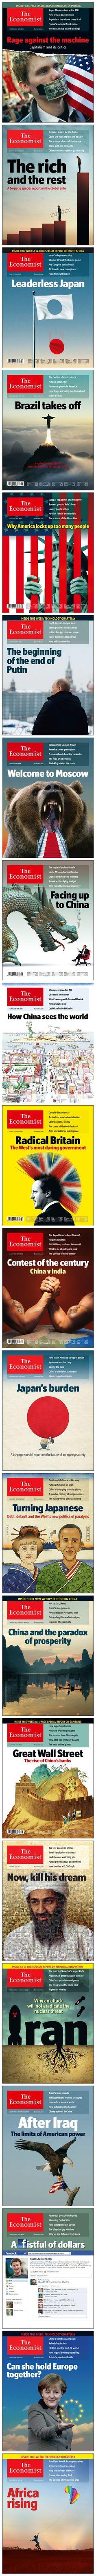 Covers of The Economist. Brilliant!